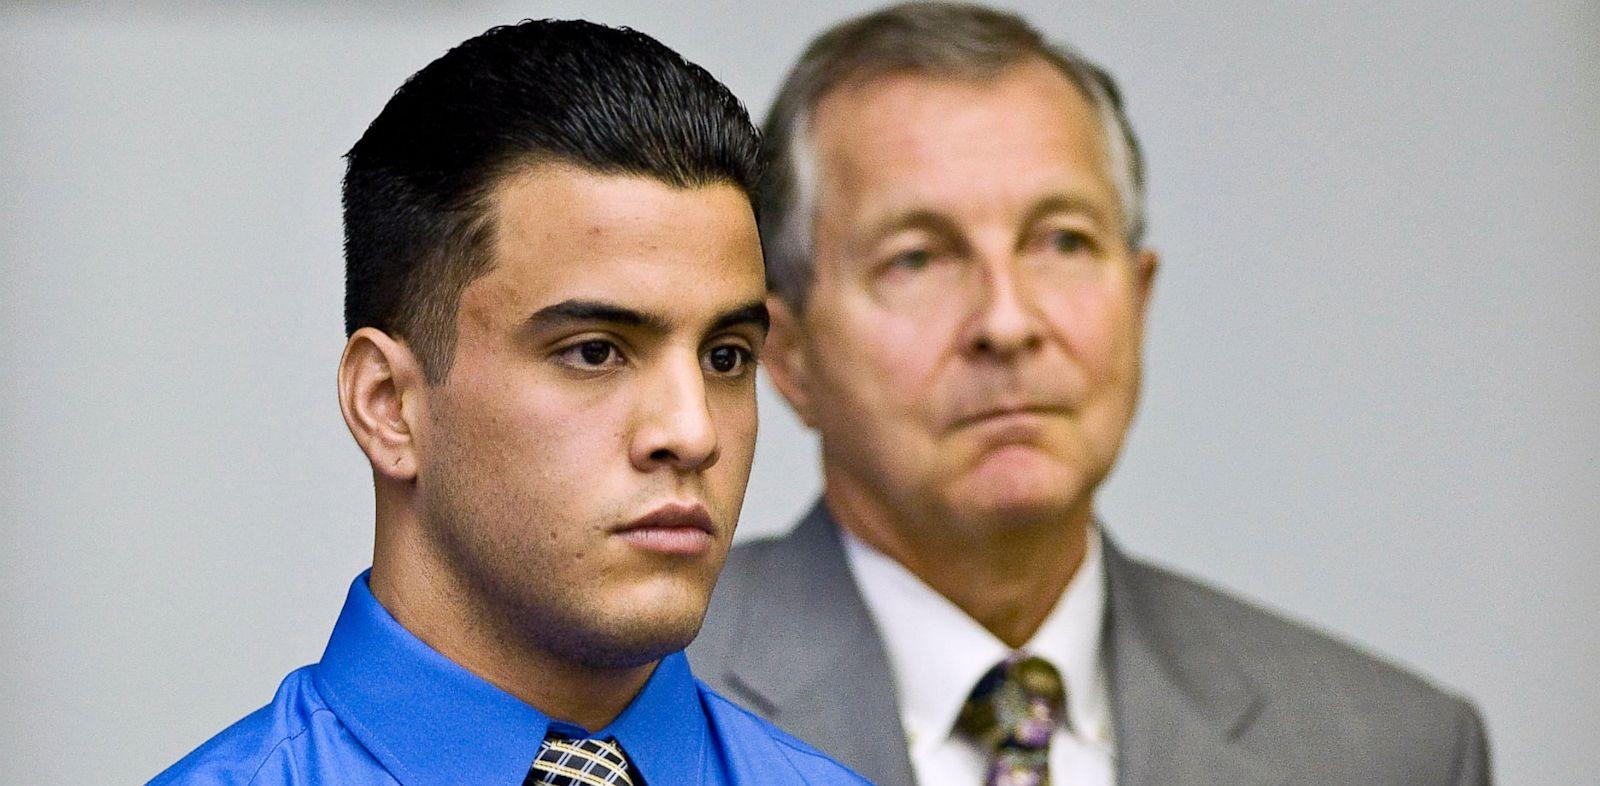 PHOTO: Nicholas Cendoya in court